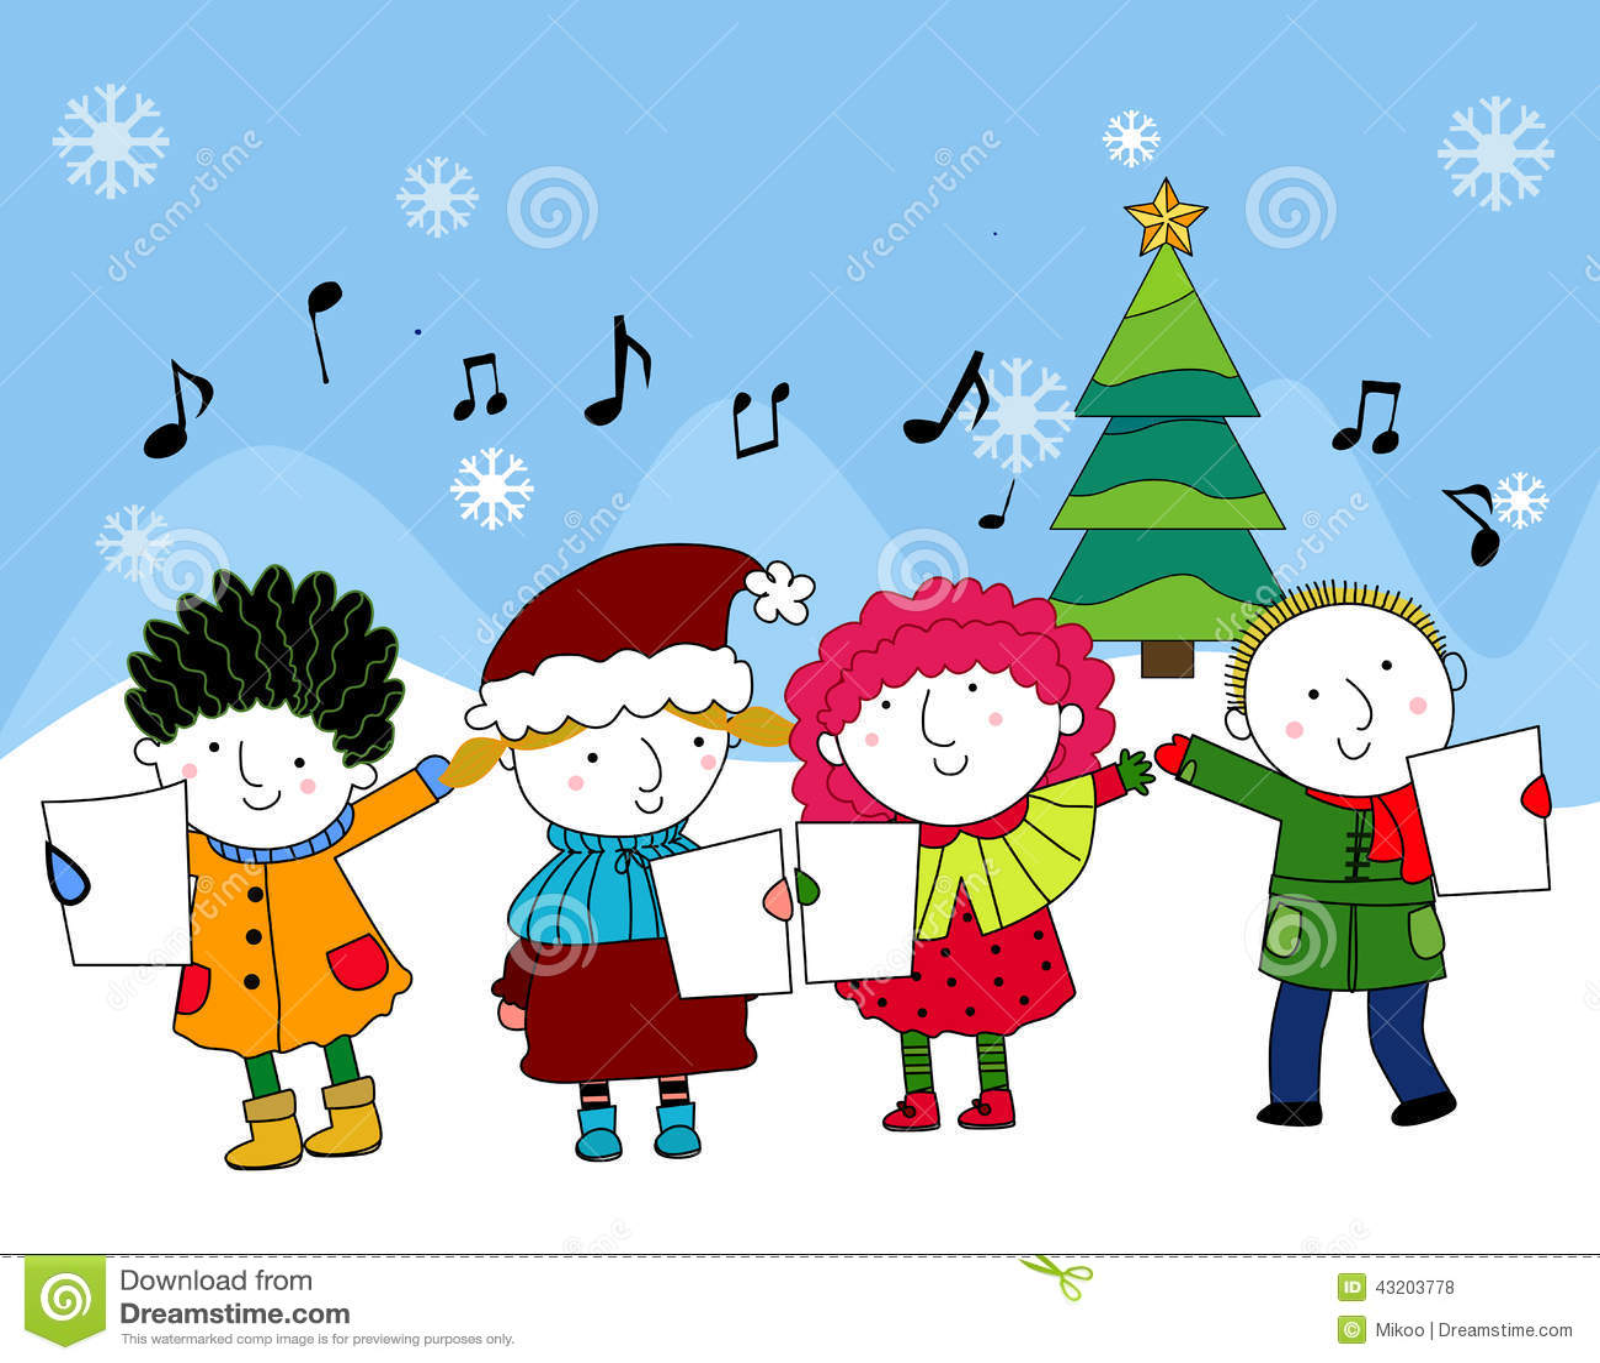 Christmas carols stock vector. Illustration of cartoon - 43203778